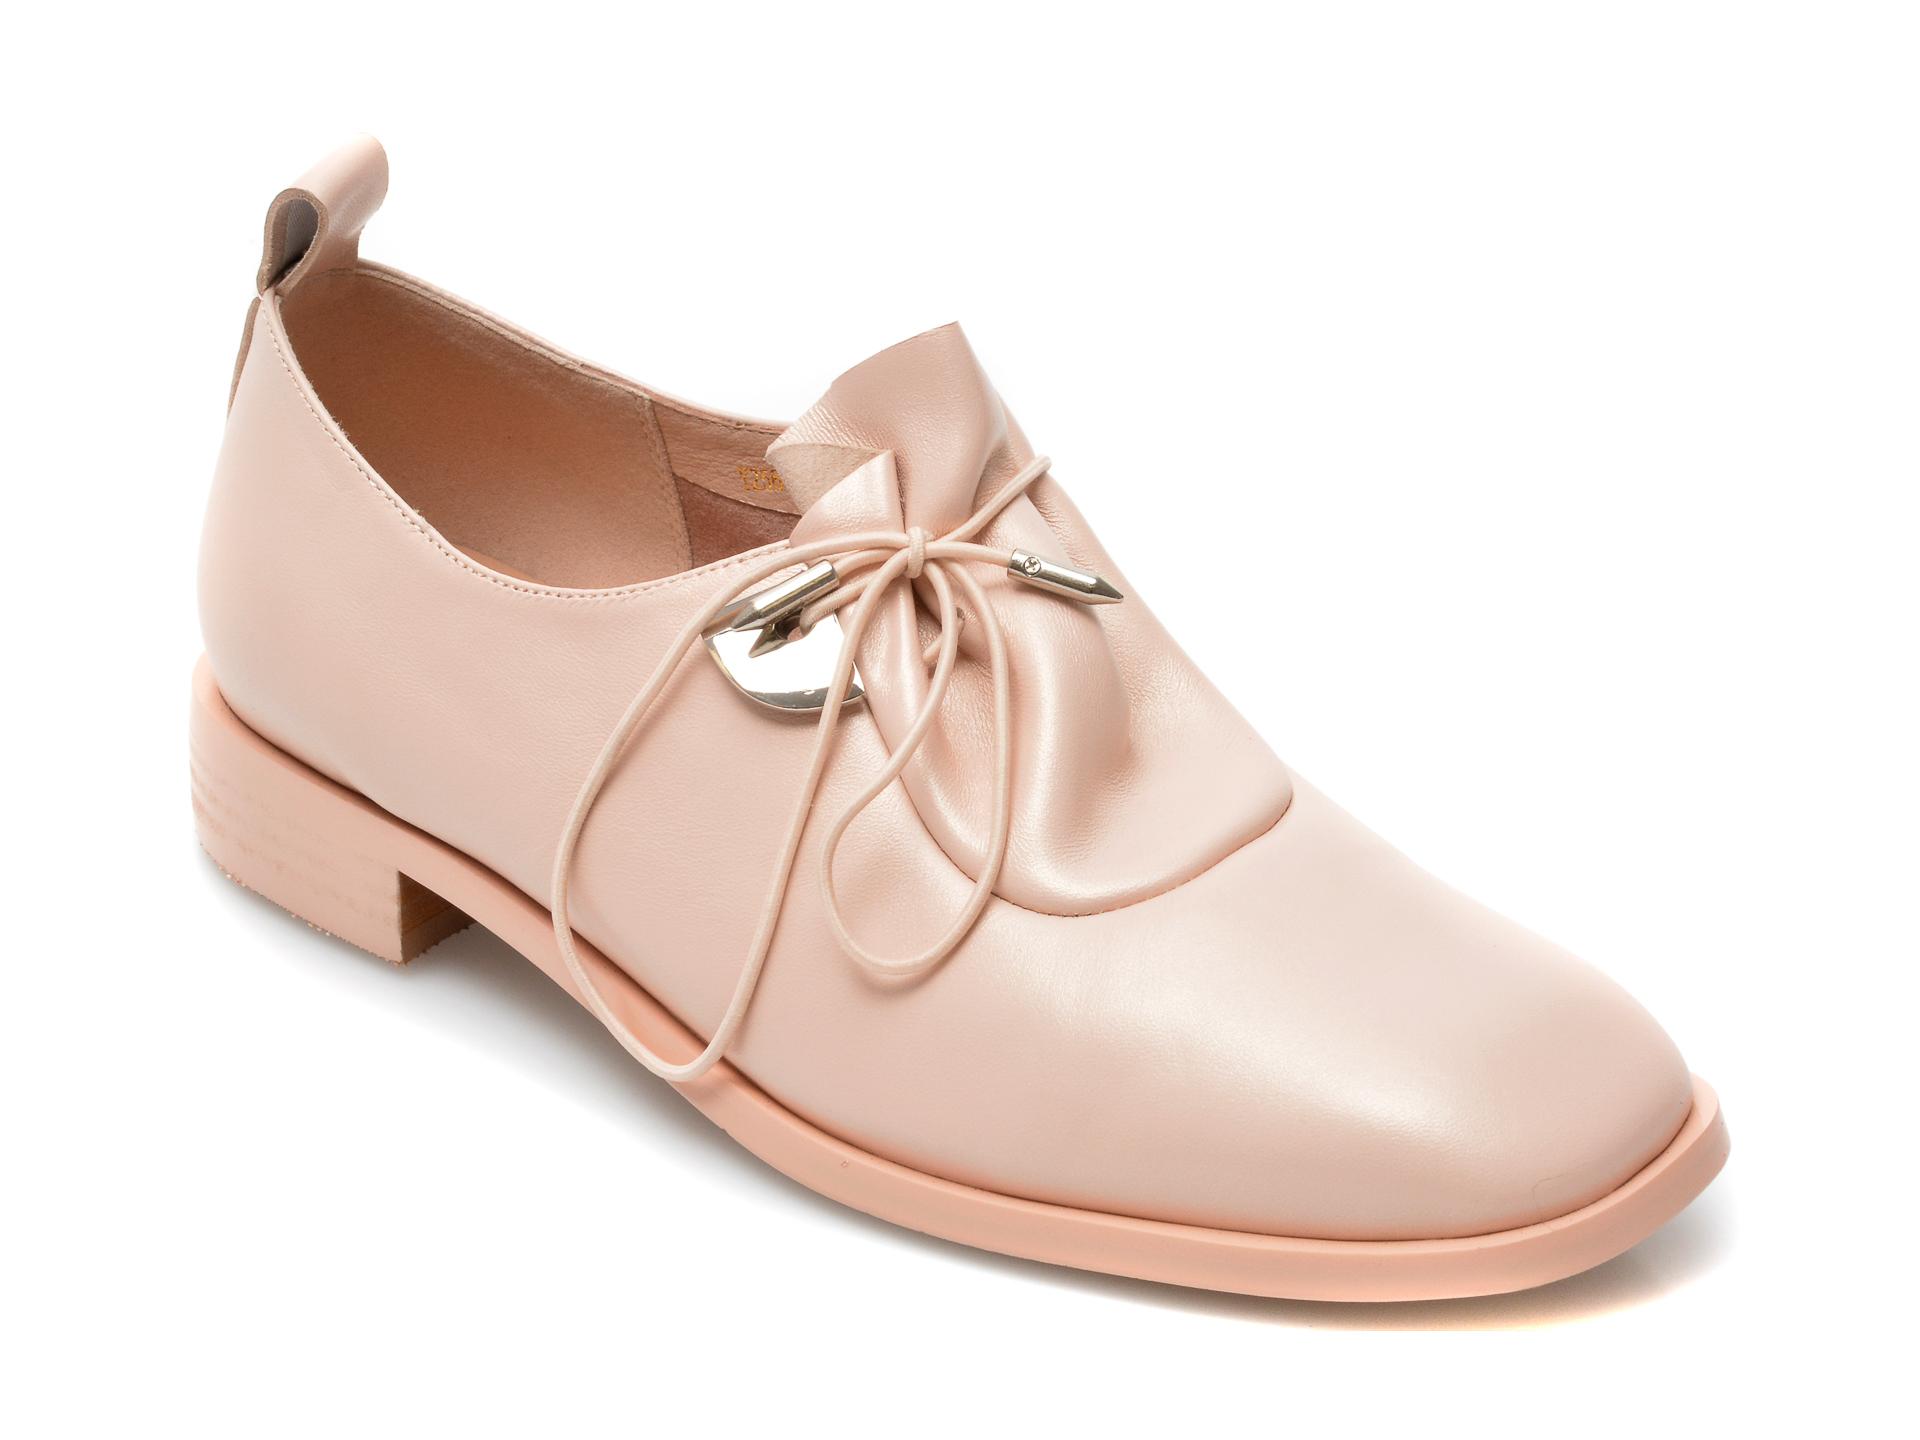 Pantofi EPICA roz, Y2561Q1, din piele naturala imagine otter.ro 2021